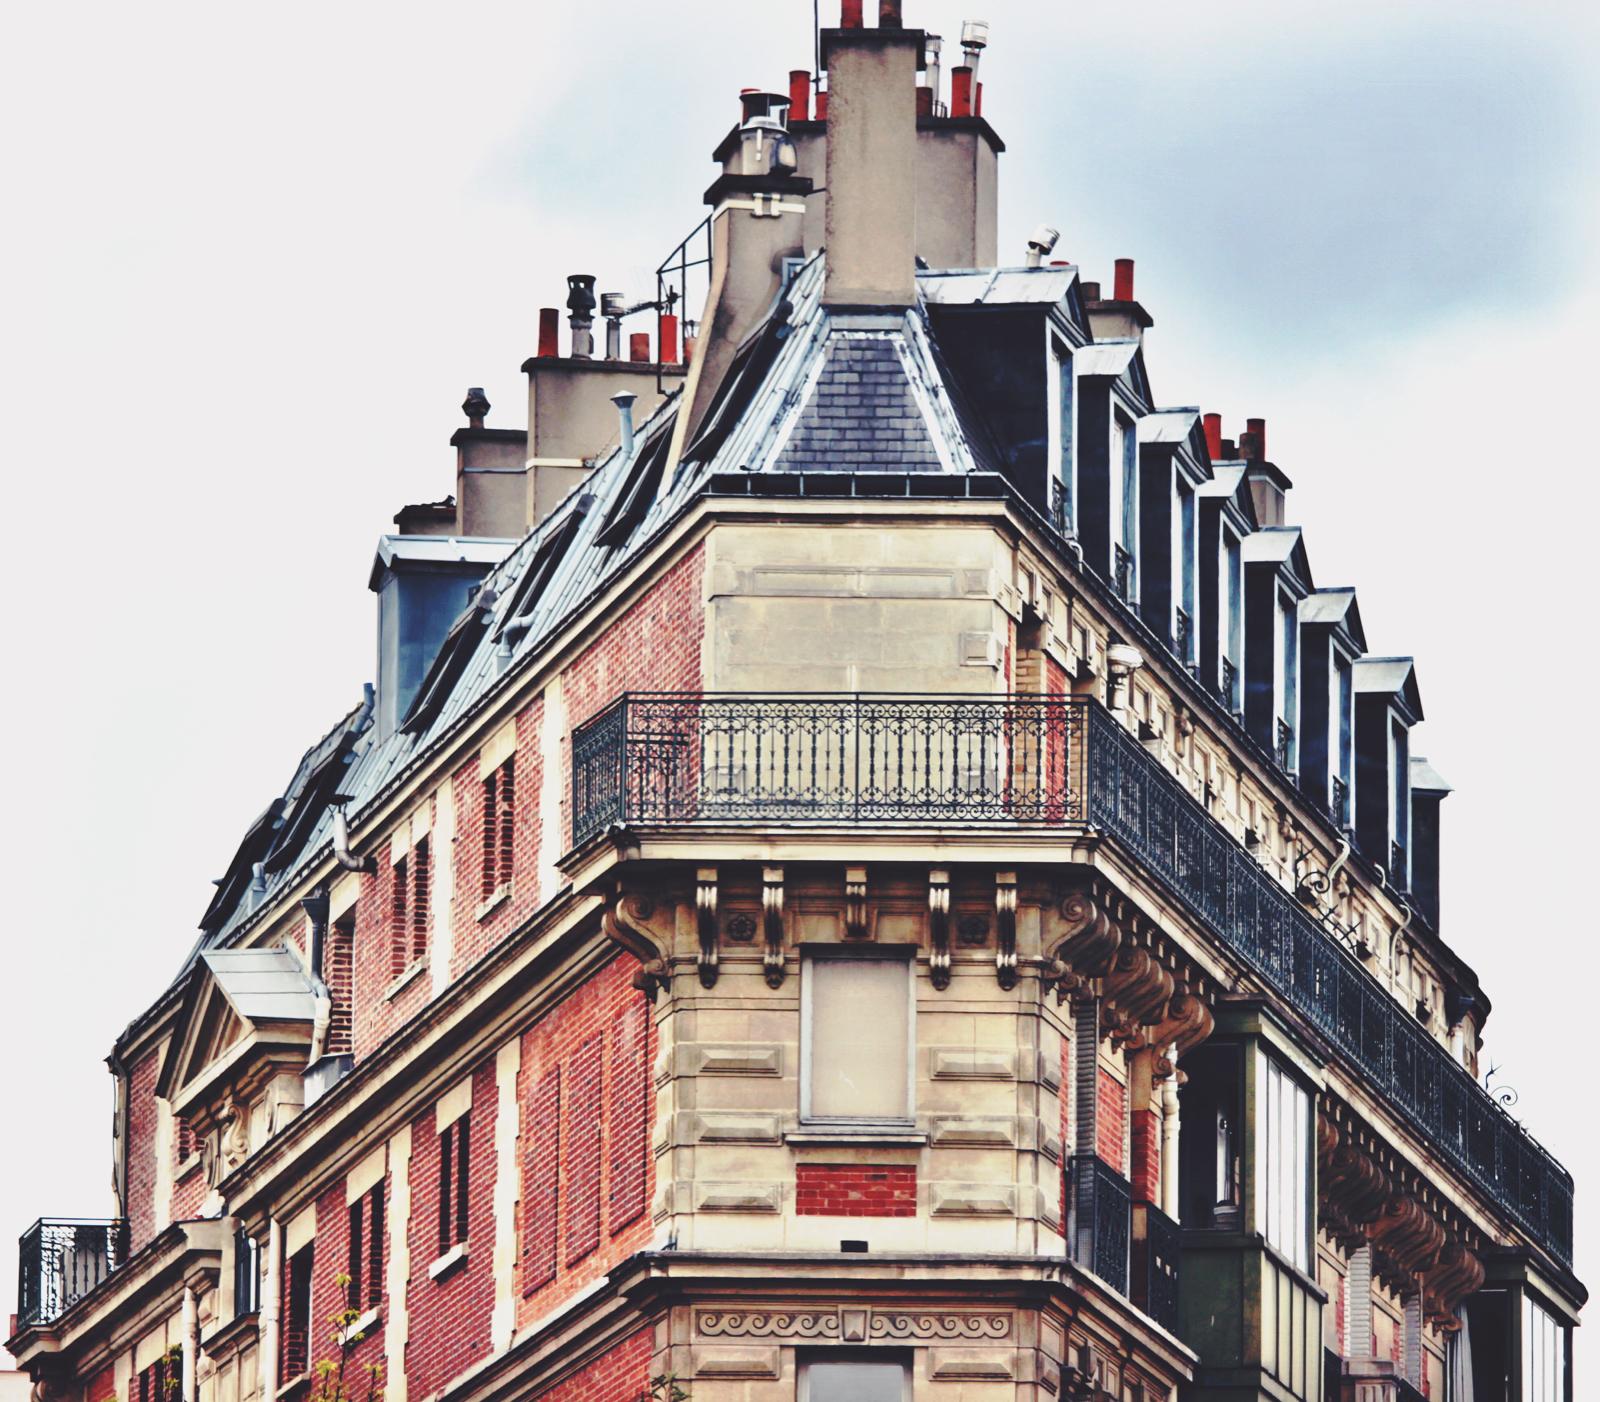 Just one example of beautiful Parisienne balconies